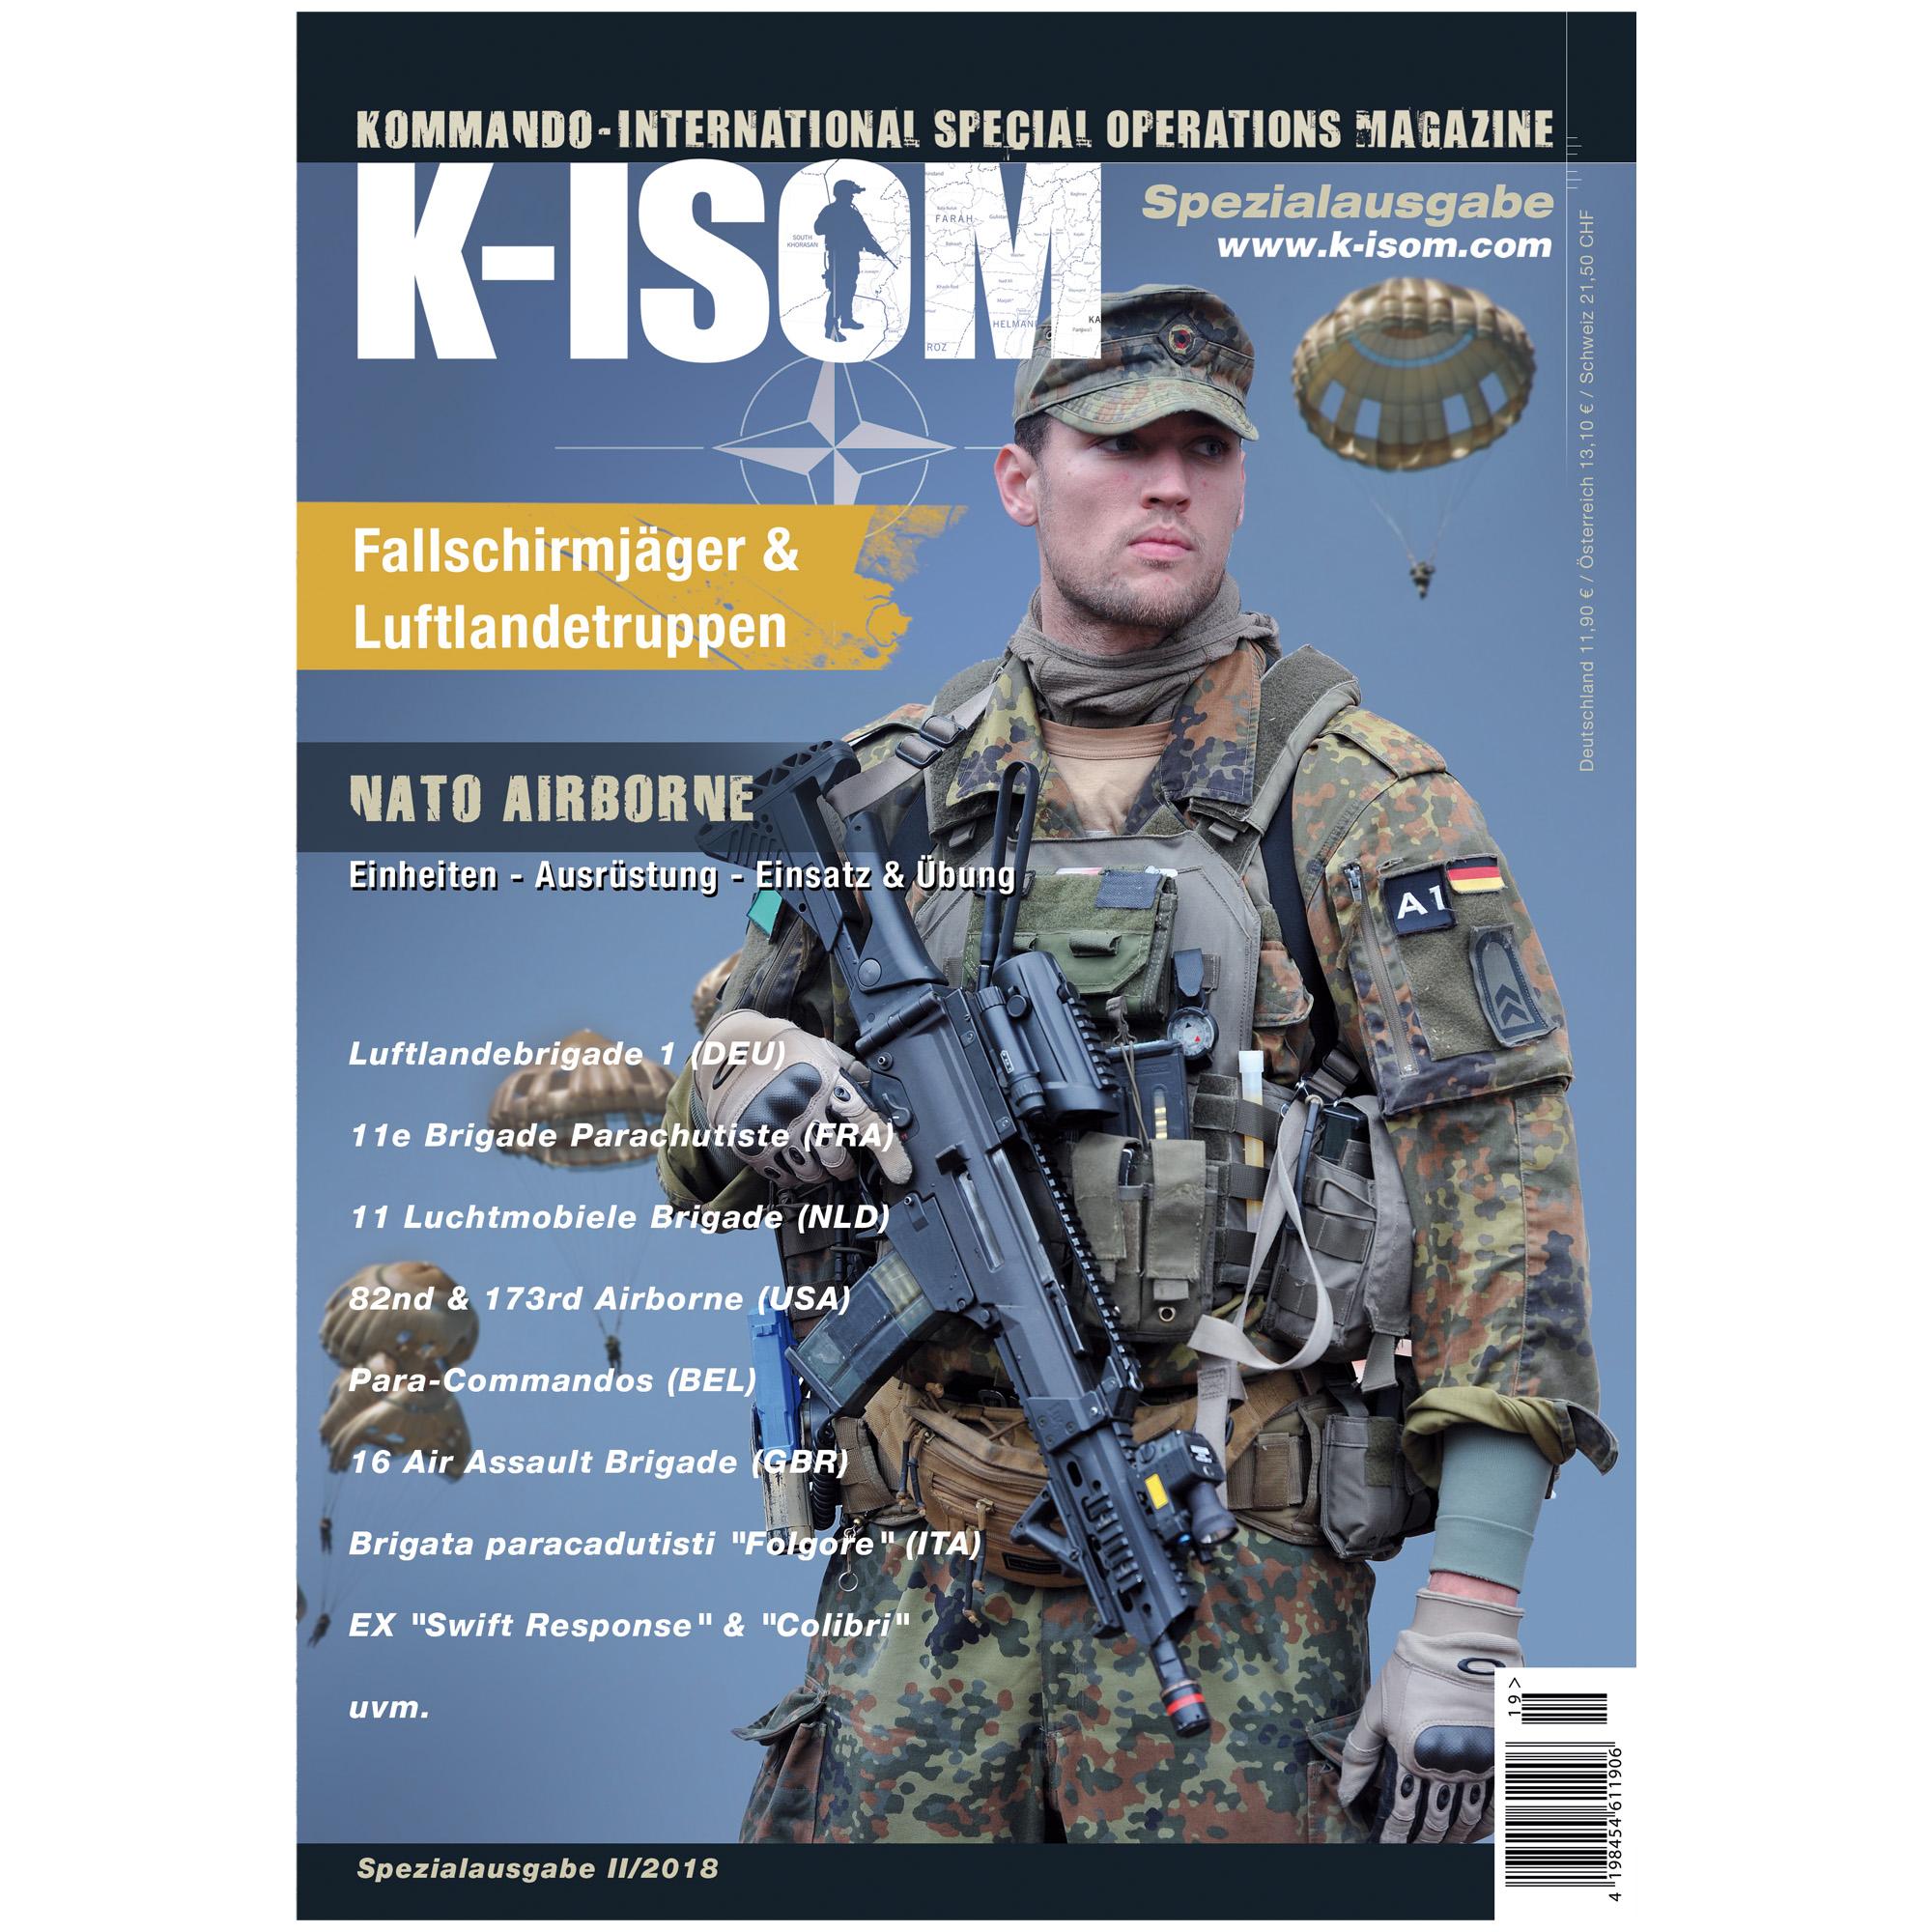 Kommando Magazin K-ISOM Spezialausgabe II/2018 NATO Airborne